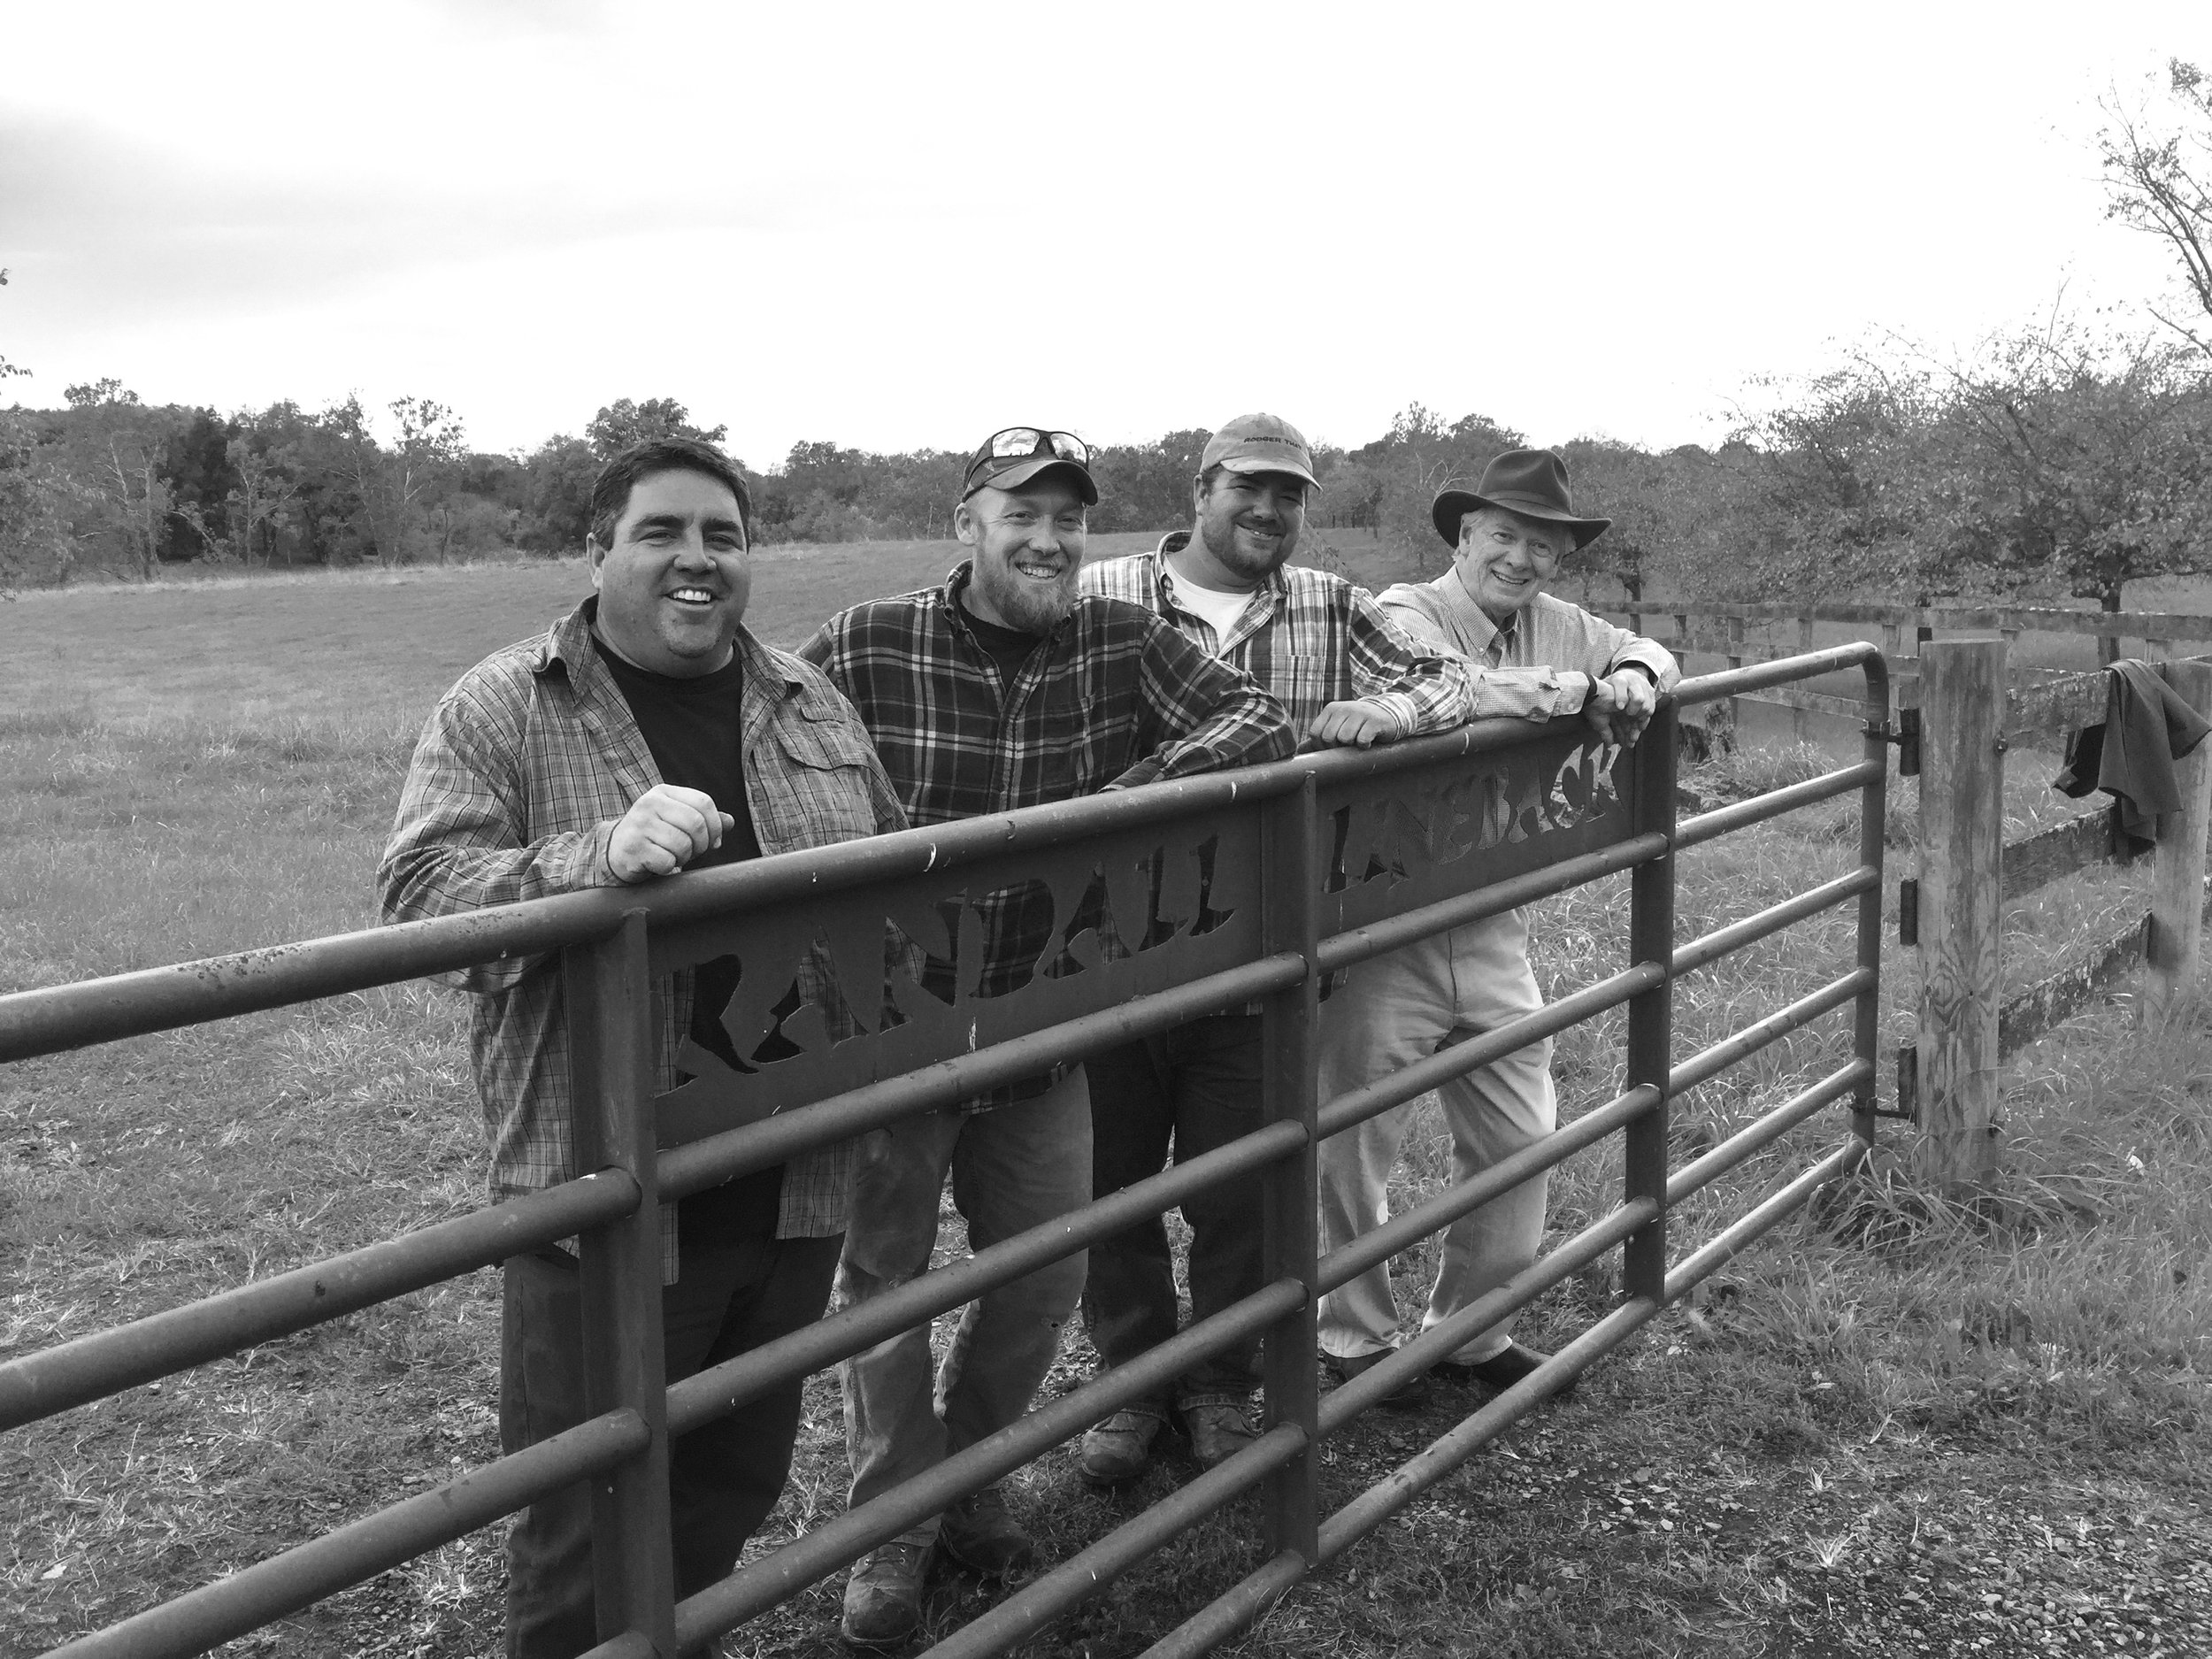 The Chapel Hill Farm Team